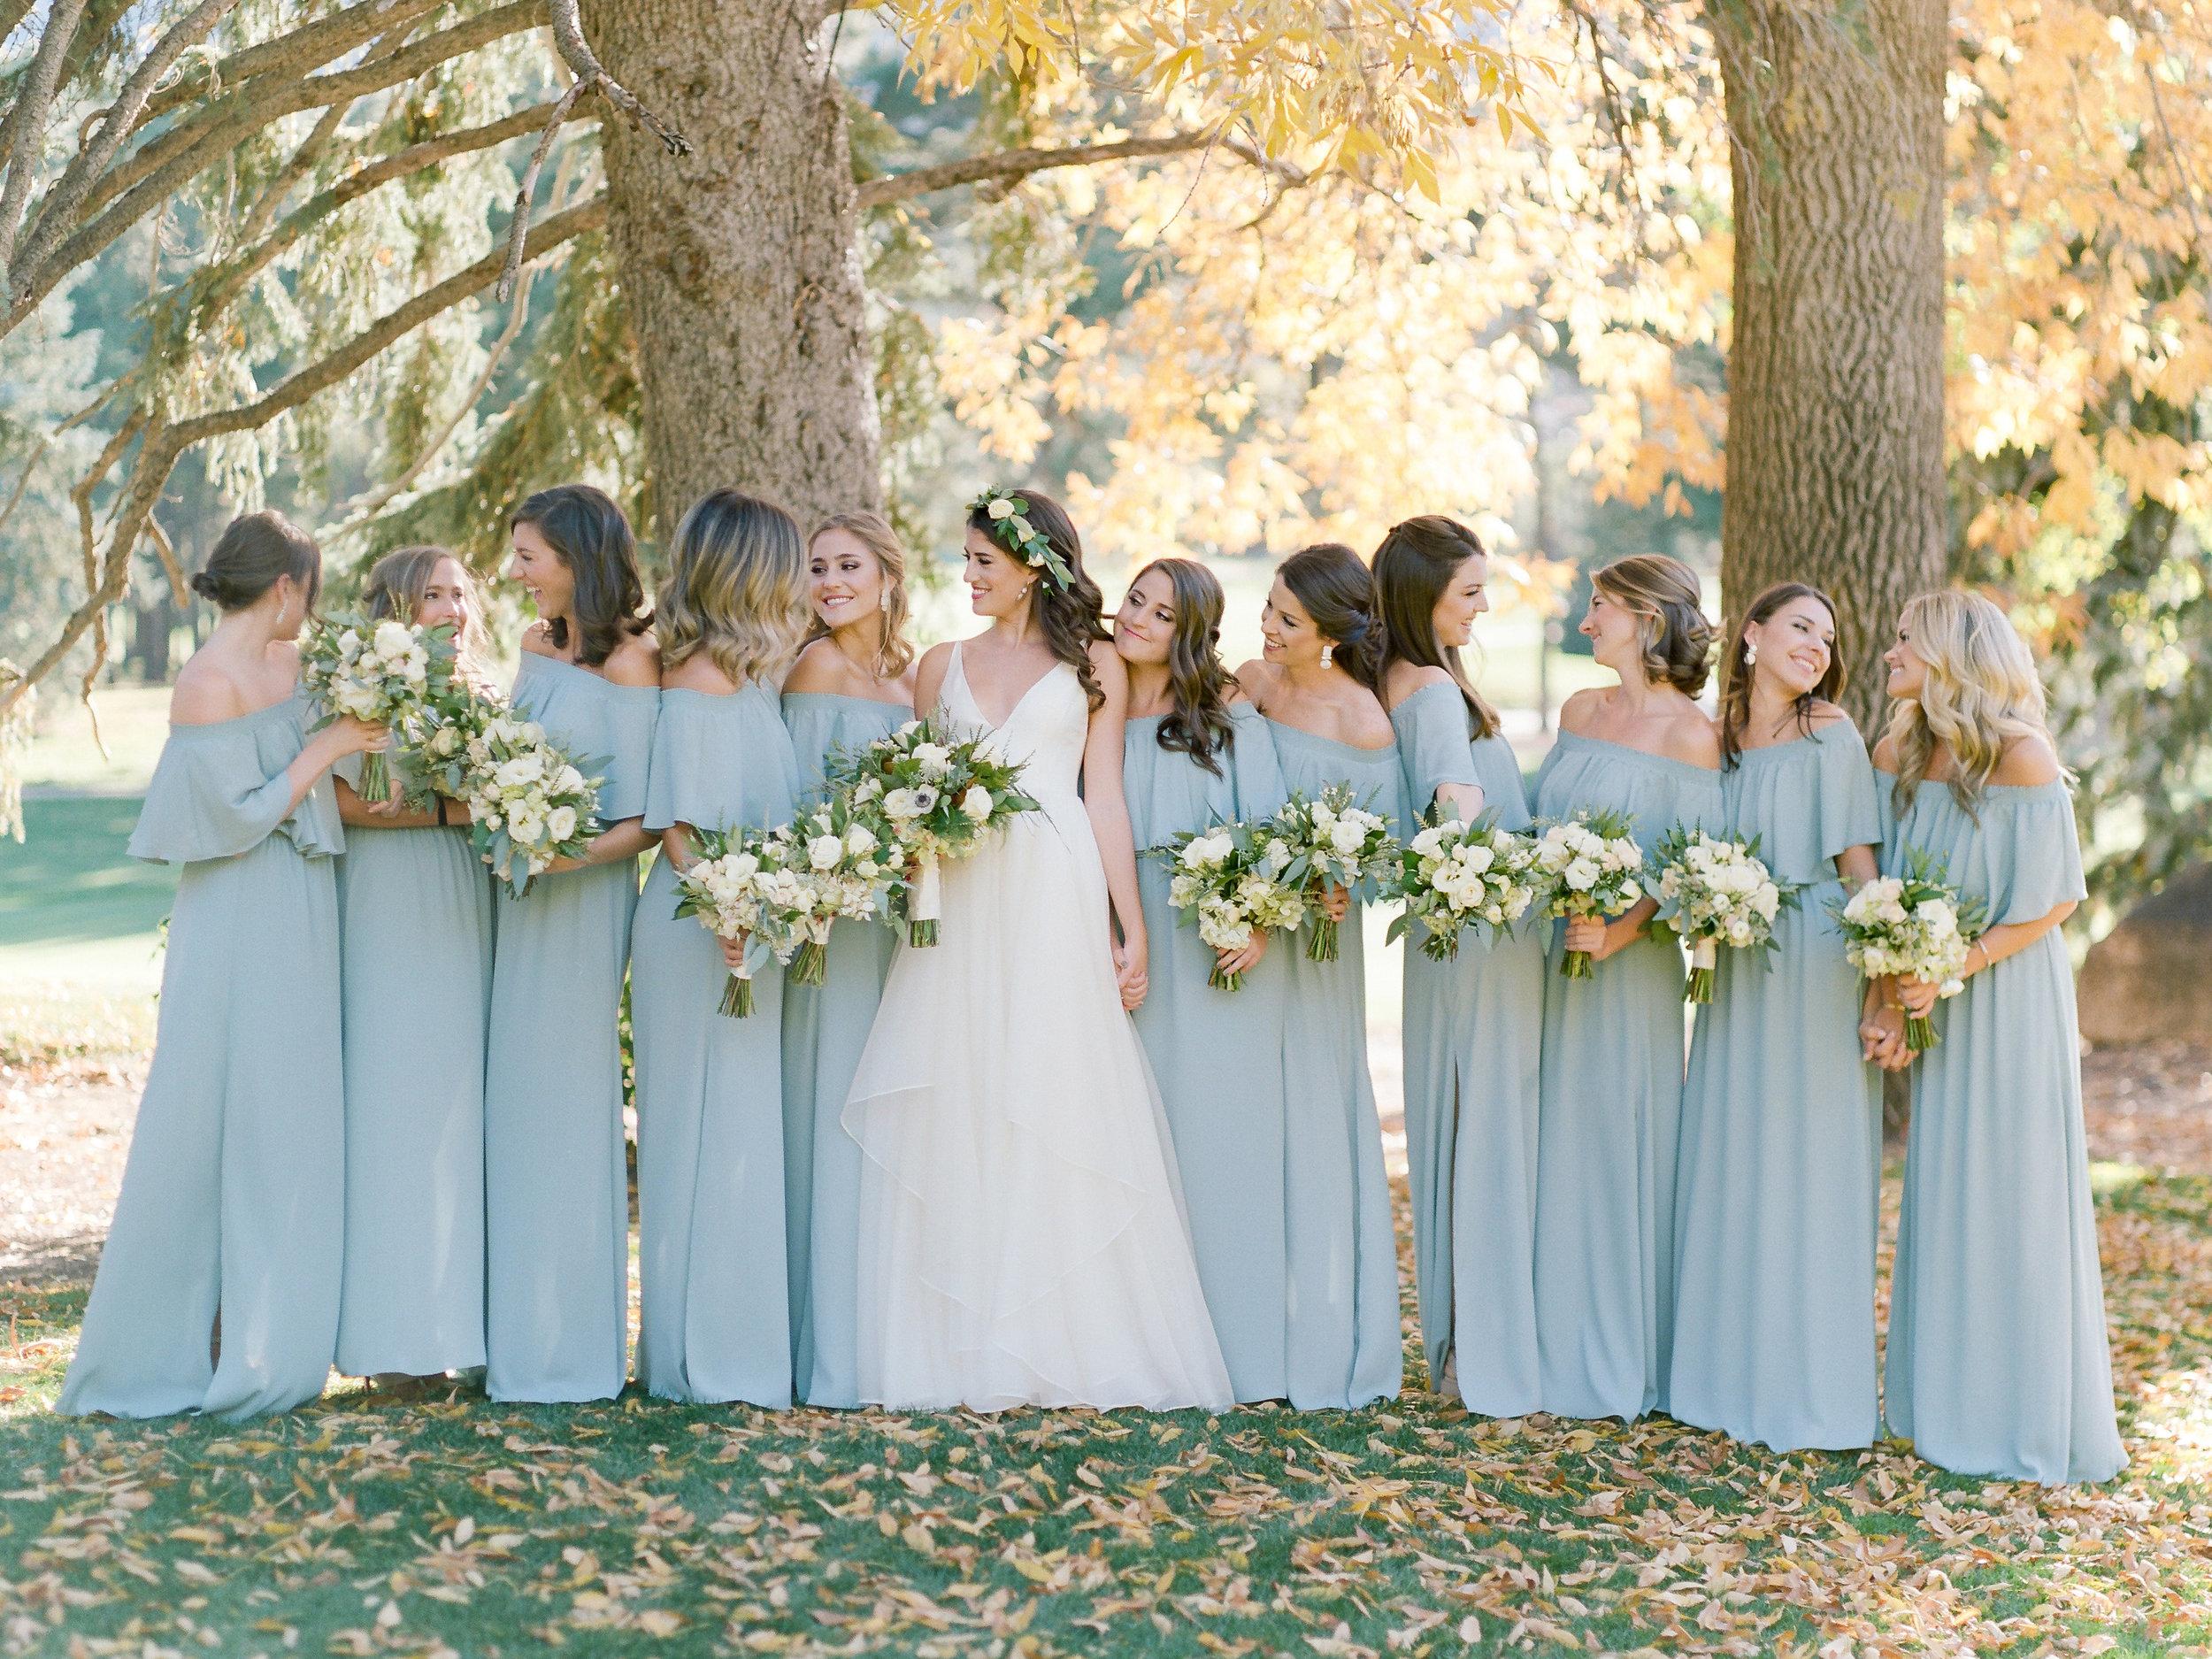 kathleen-patrick-wedding-portraits-36.jpg